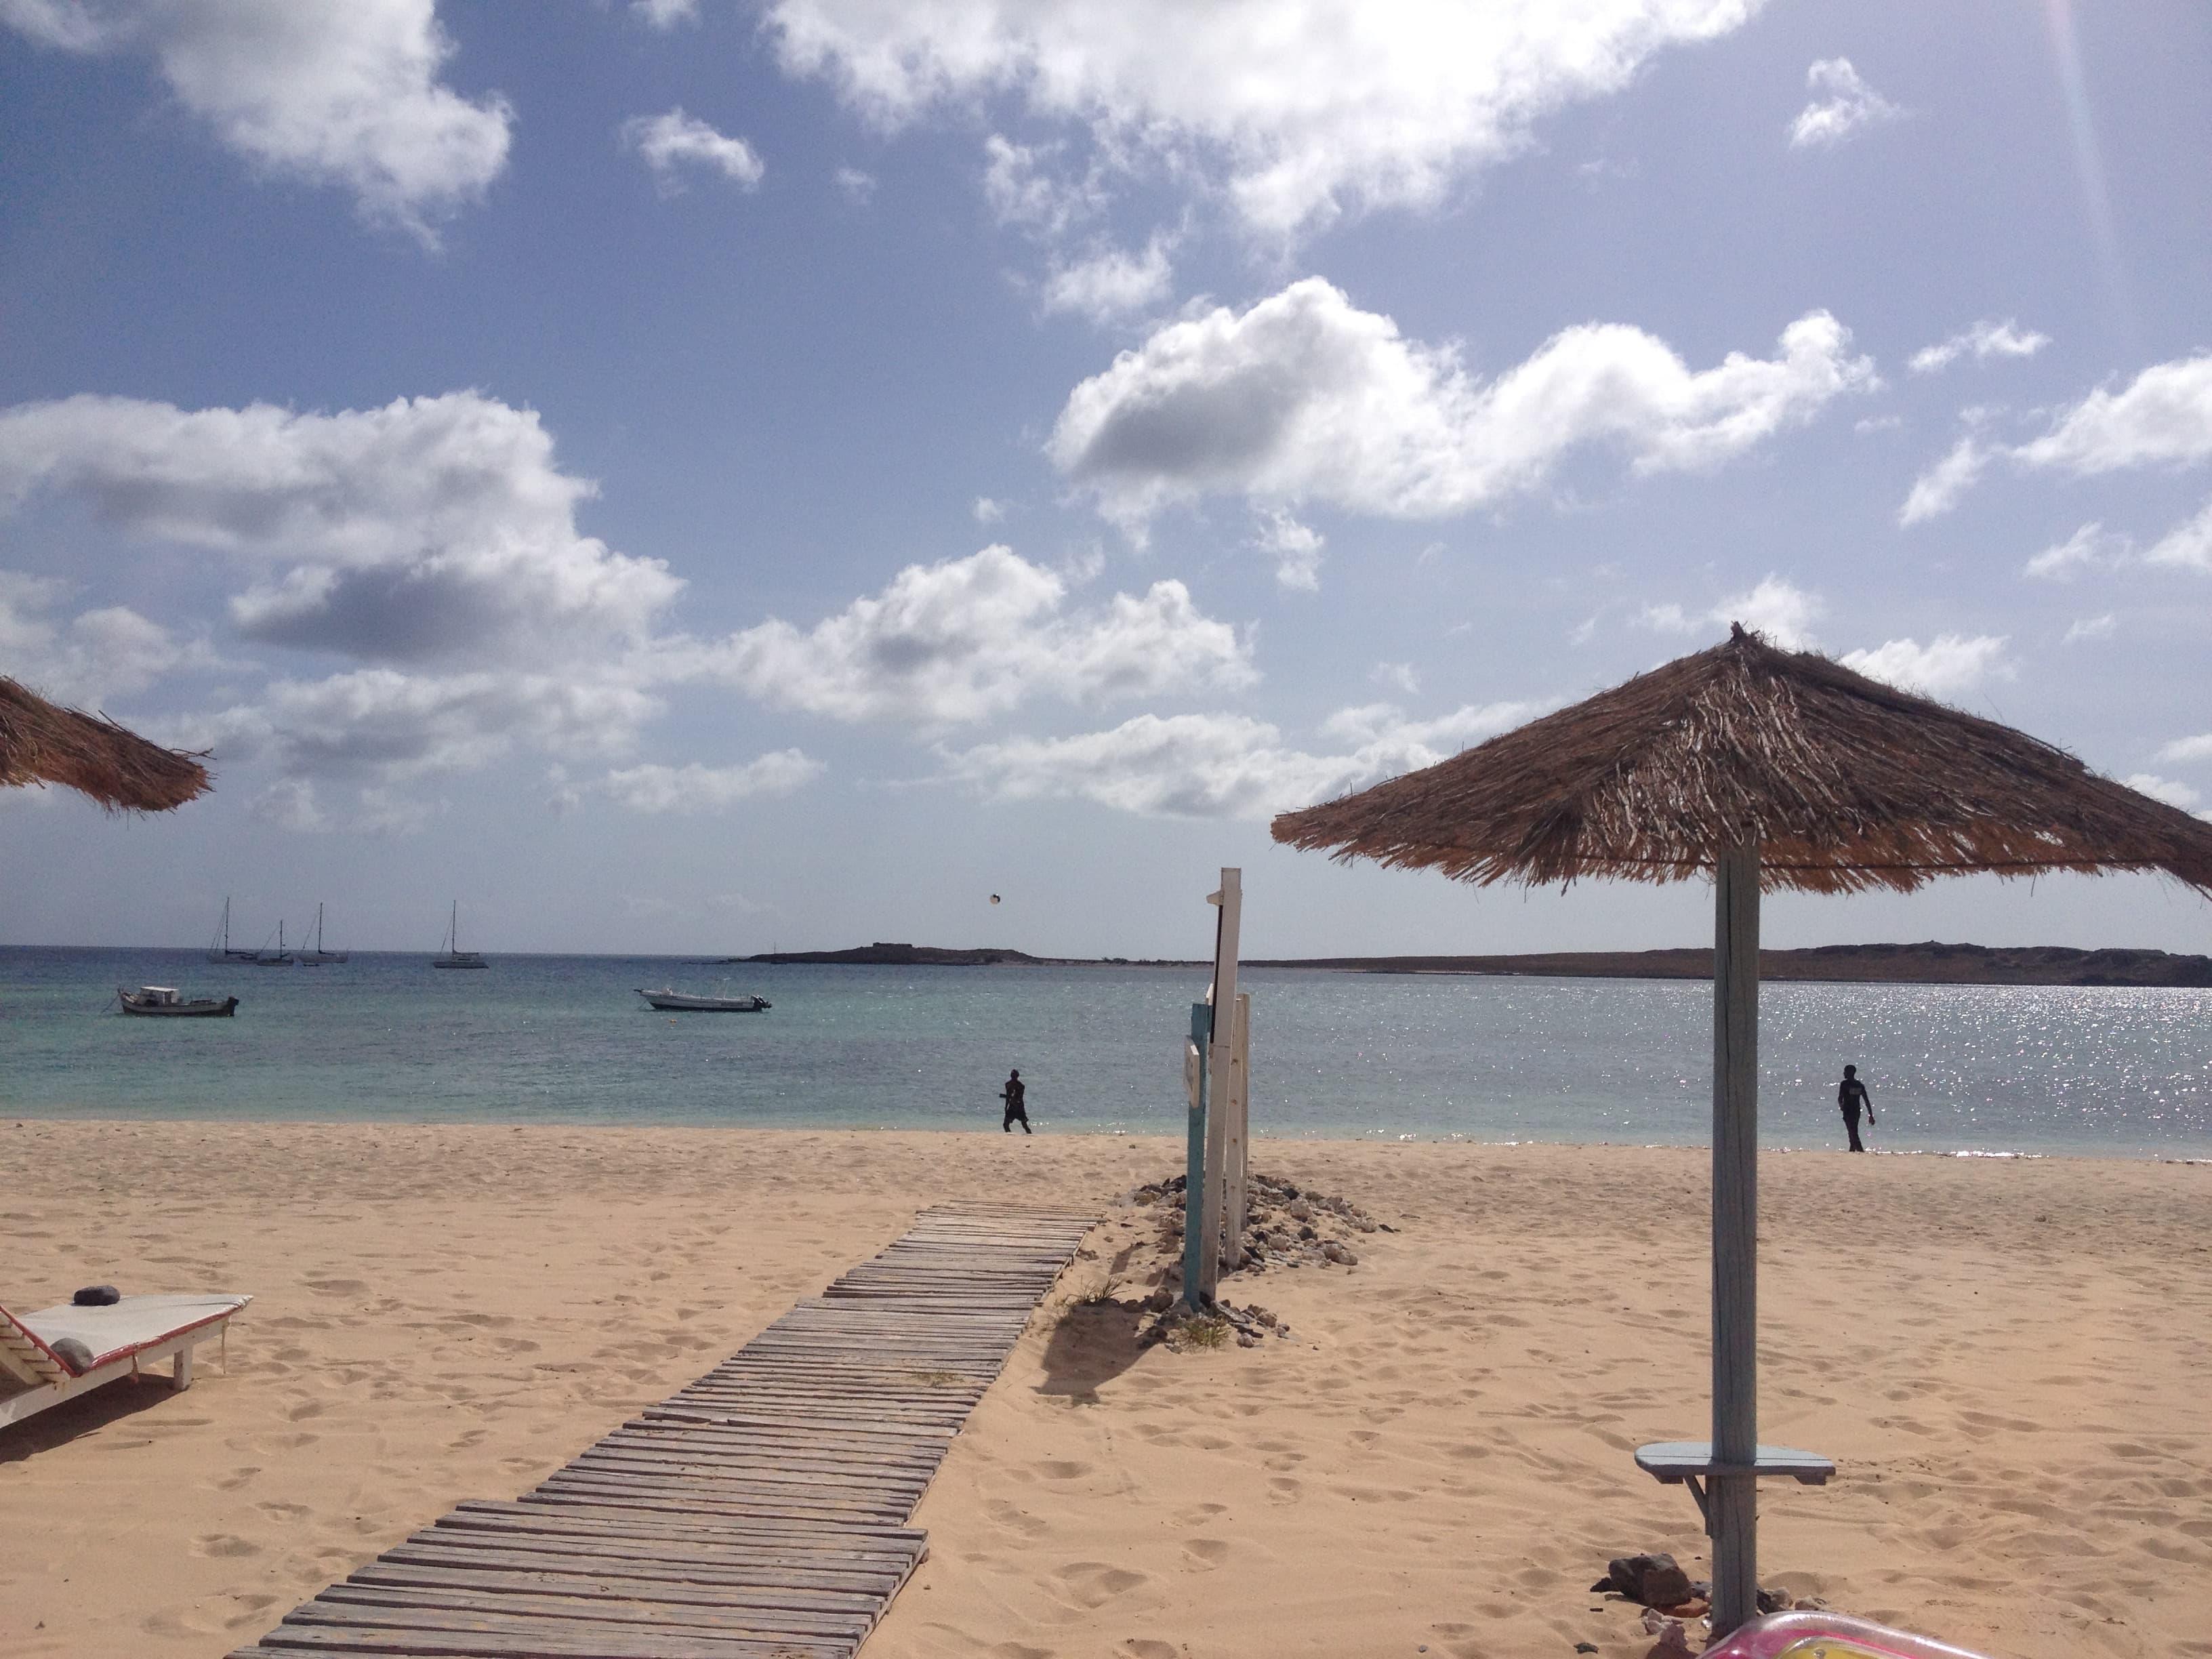 Perfekte Erholung auf Boa Vista Insel